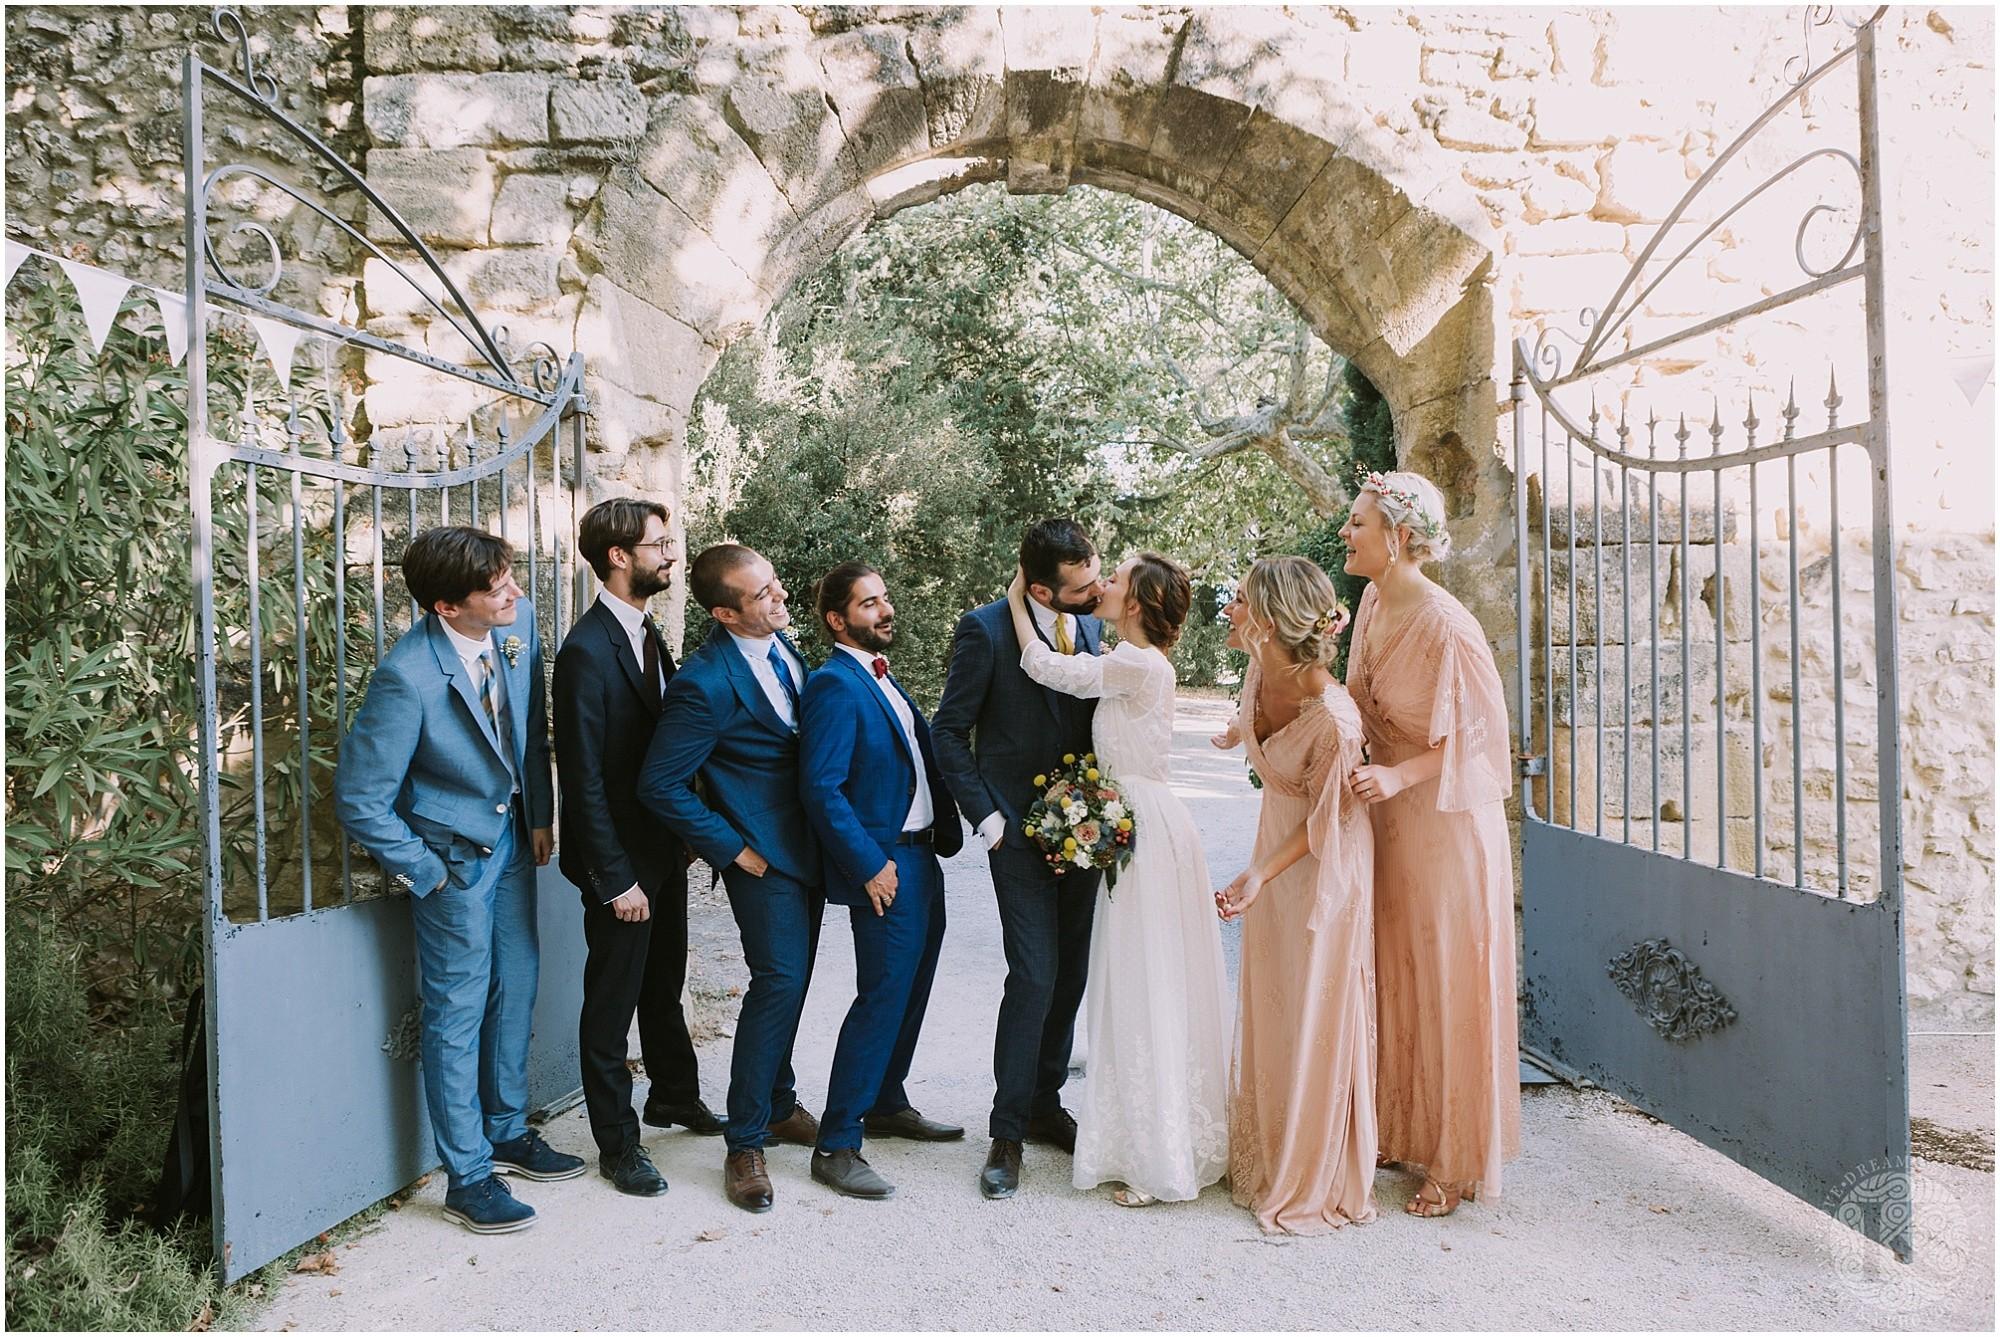 Kateryna-photos-photographe-mariage-vaucluse-provence-avignon-ferme-st-hugues_0061.jpg